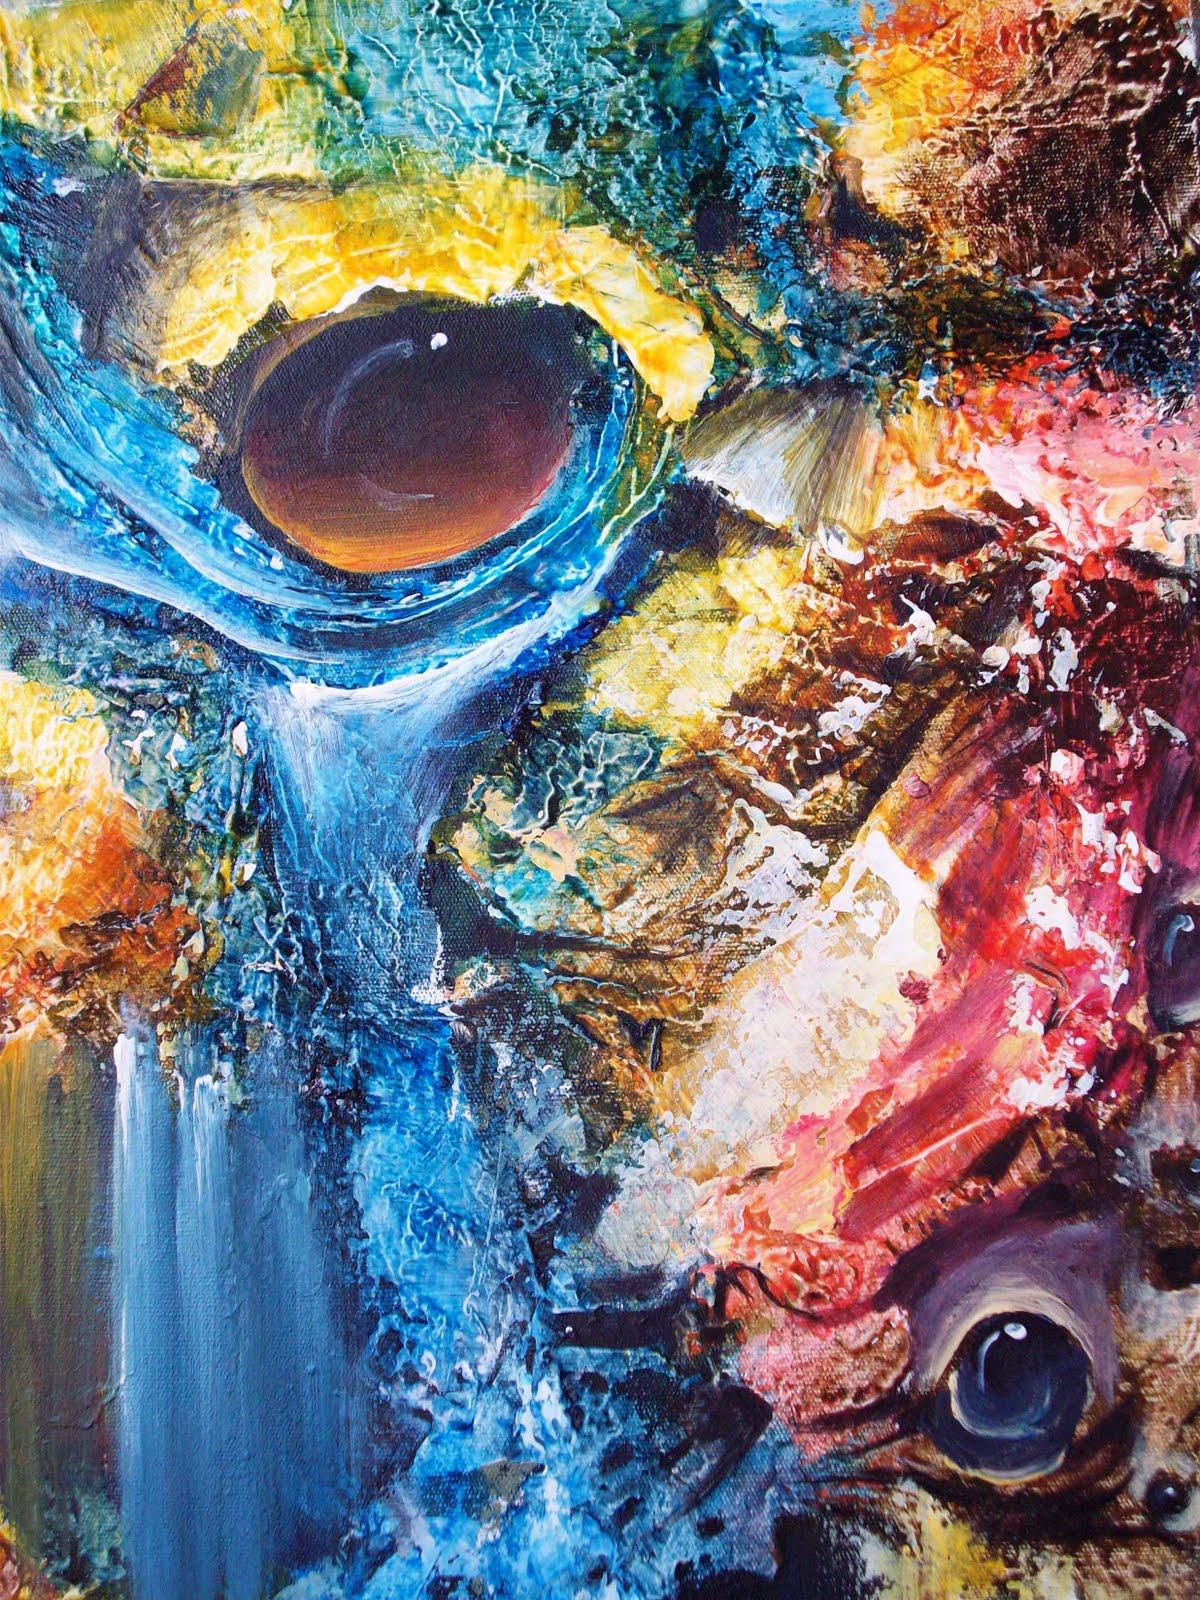 Fiona S Space Contoh Lukisan Abstrak